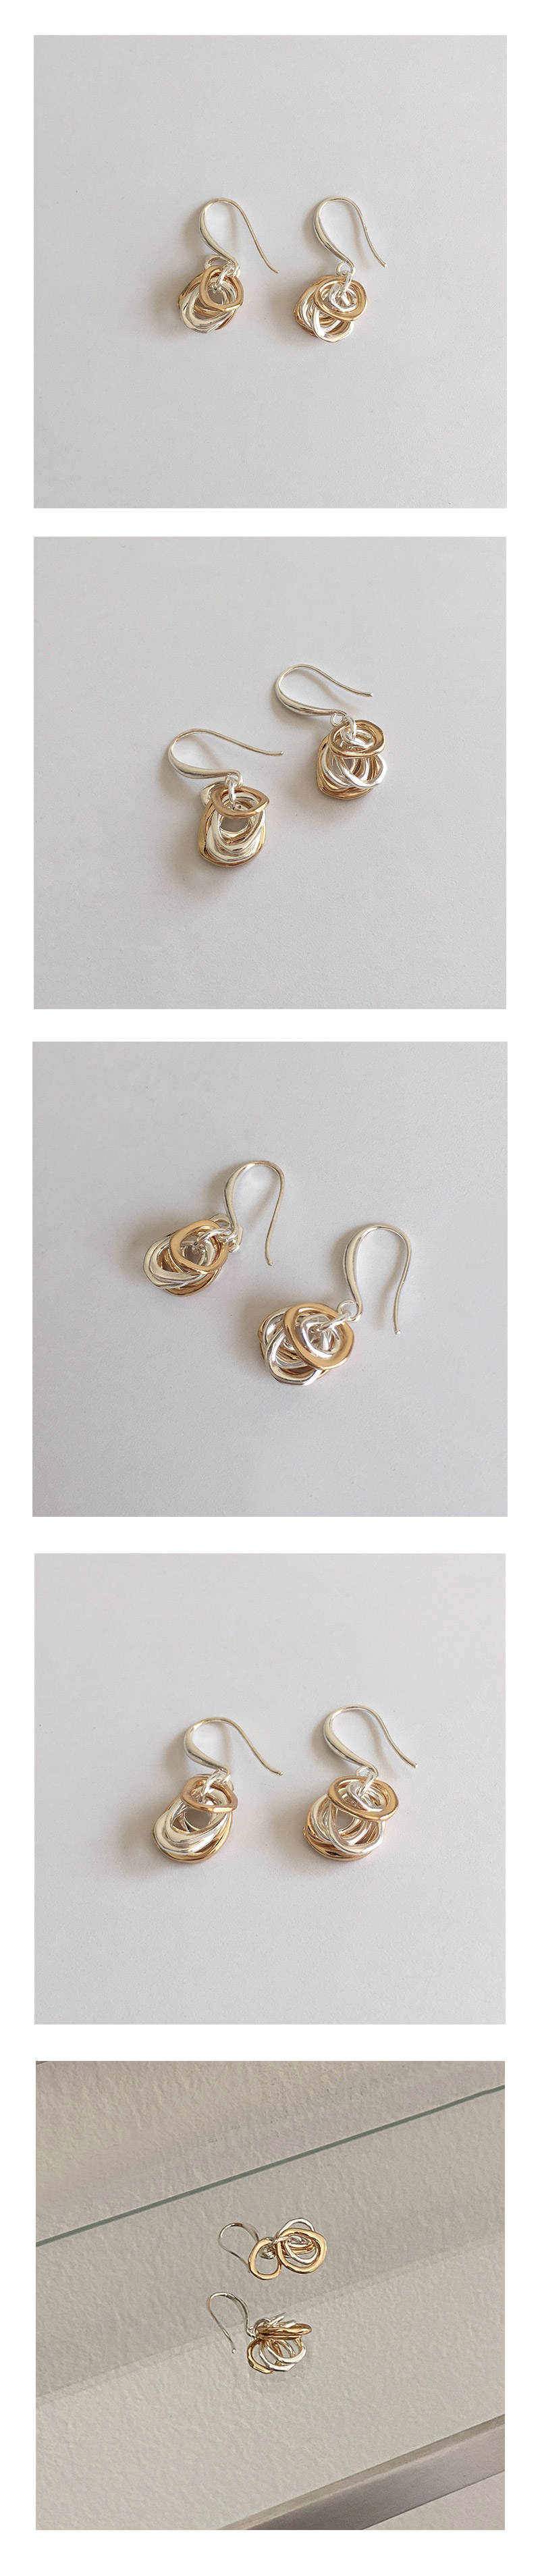 stain combi earring